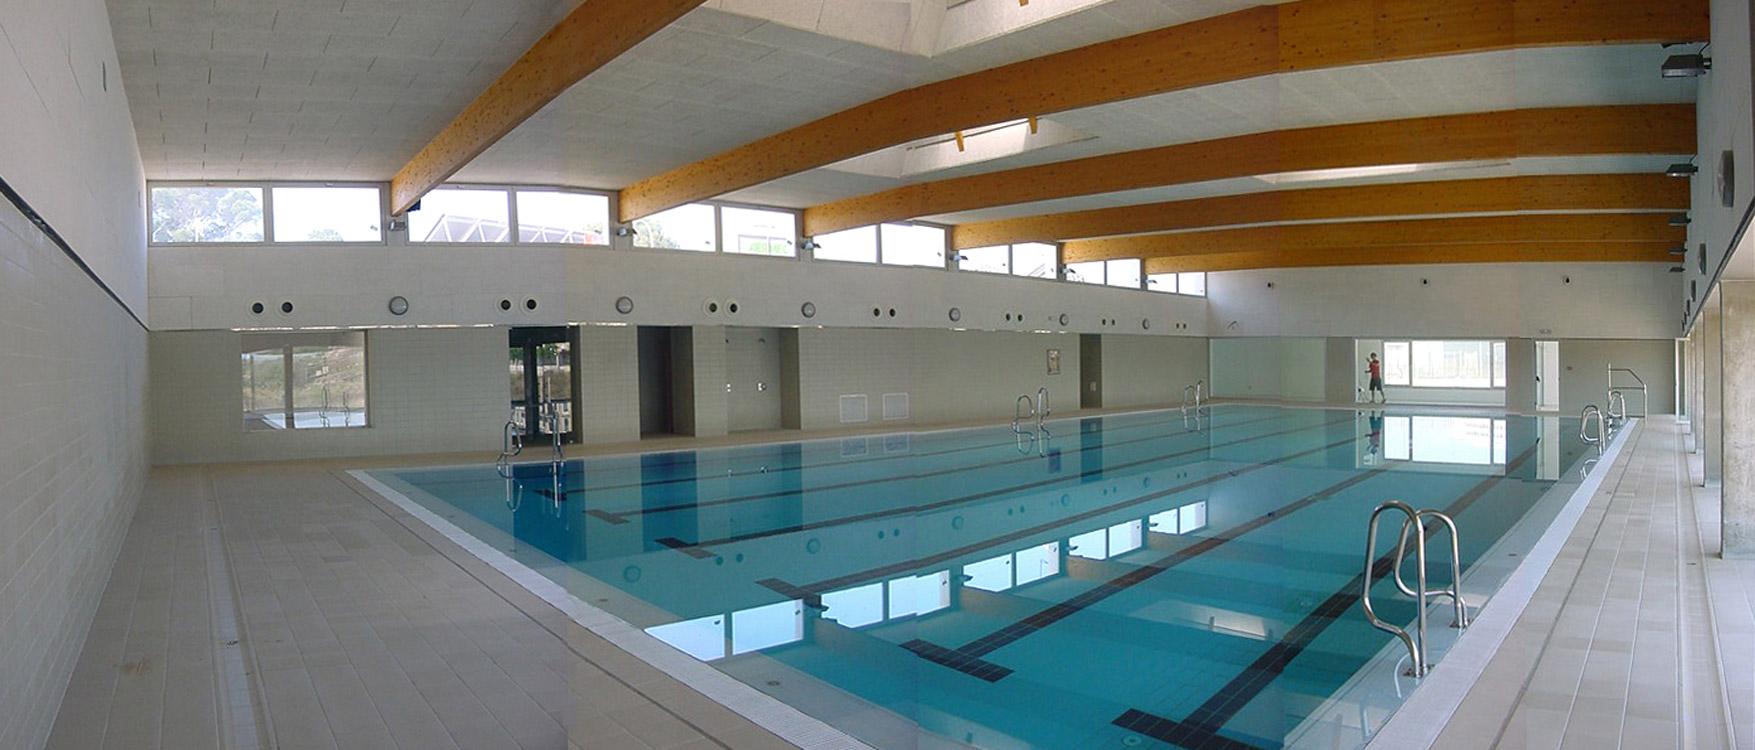 piscina municipal toni servera arquitectos canyaveral fontes